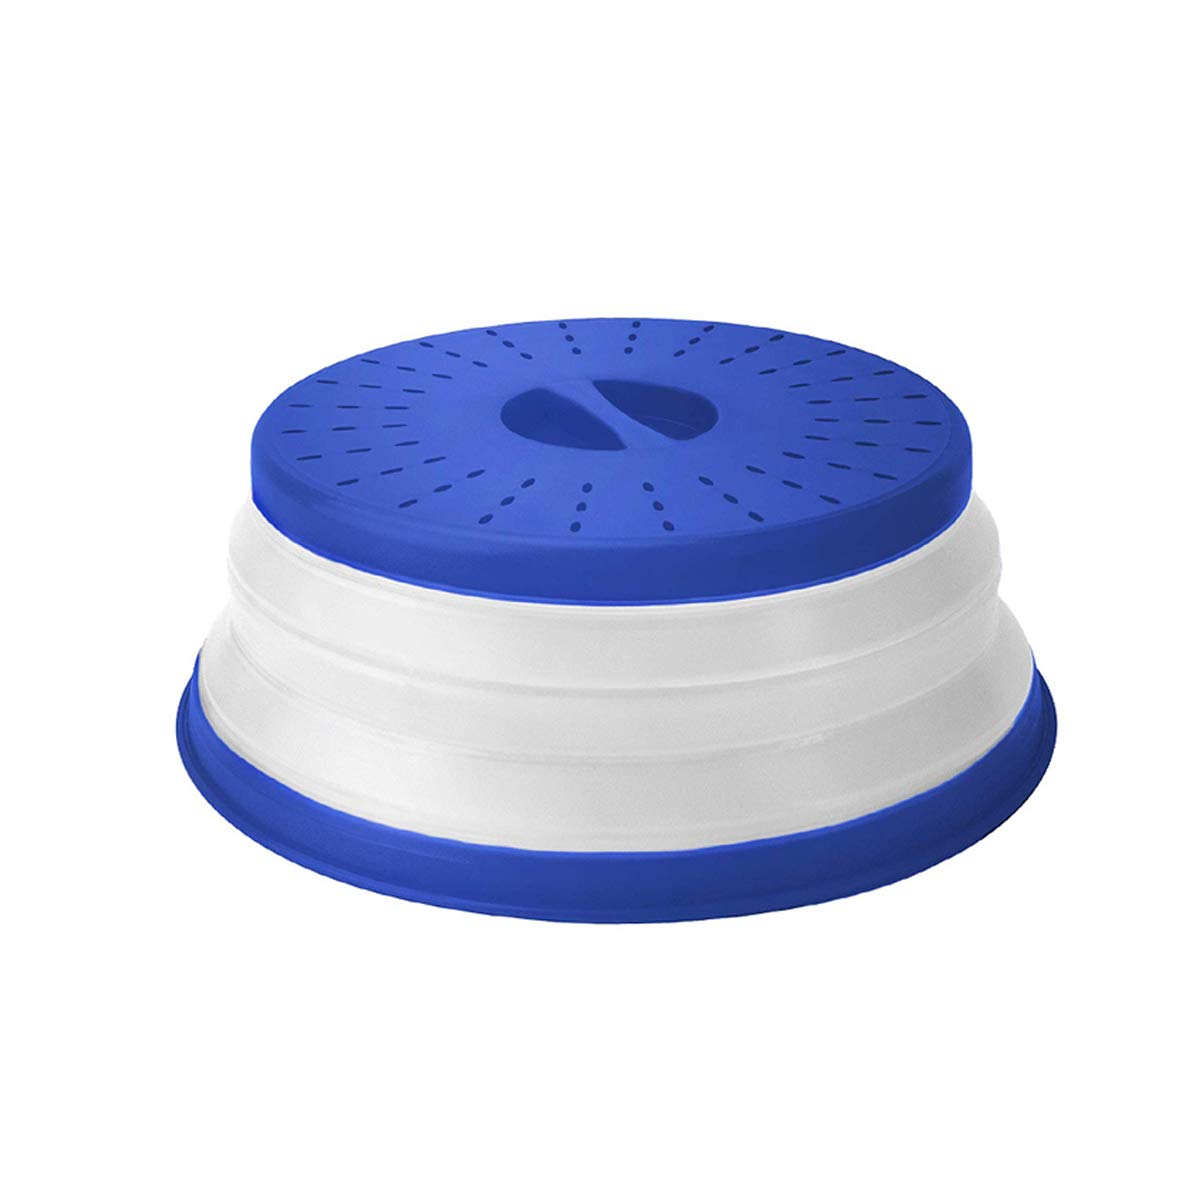 ANTEER Tapa Microondas Plegable con Ventilación Plastico 26cm Sin BPA, Easy Grip Tapa de Comida para Microondas Libre, Azul